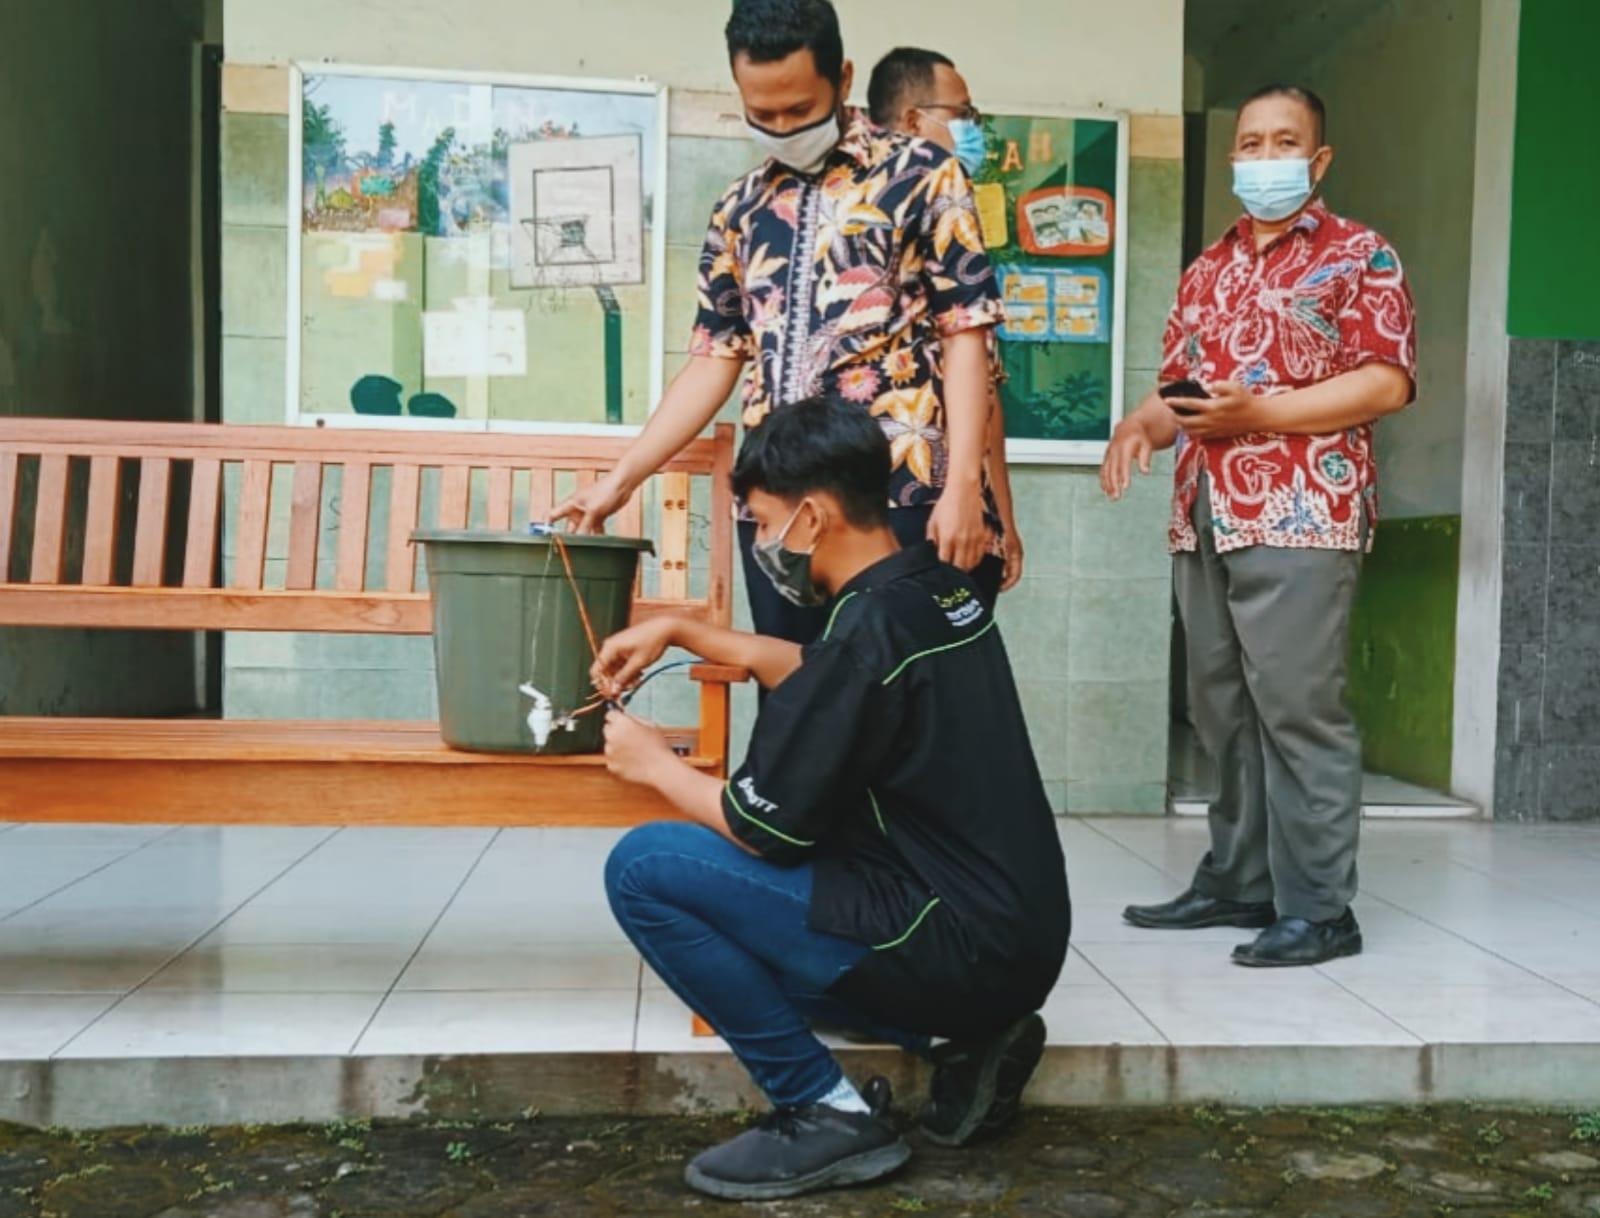 Ibrahim Khalilullah (siswa yang memakai baju hitam) dan Khoirul Muhlisin (siswa yang memakai baju motif kotak-kotak) sedang mencoba alat cuci tangan sensor. (Rangga Aji/Tugu Jatim) SMK YPM 11 Wonoayu, alat cuci tangan otomatis sensor elektronik